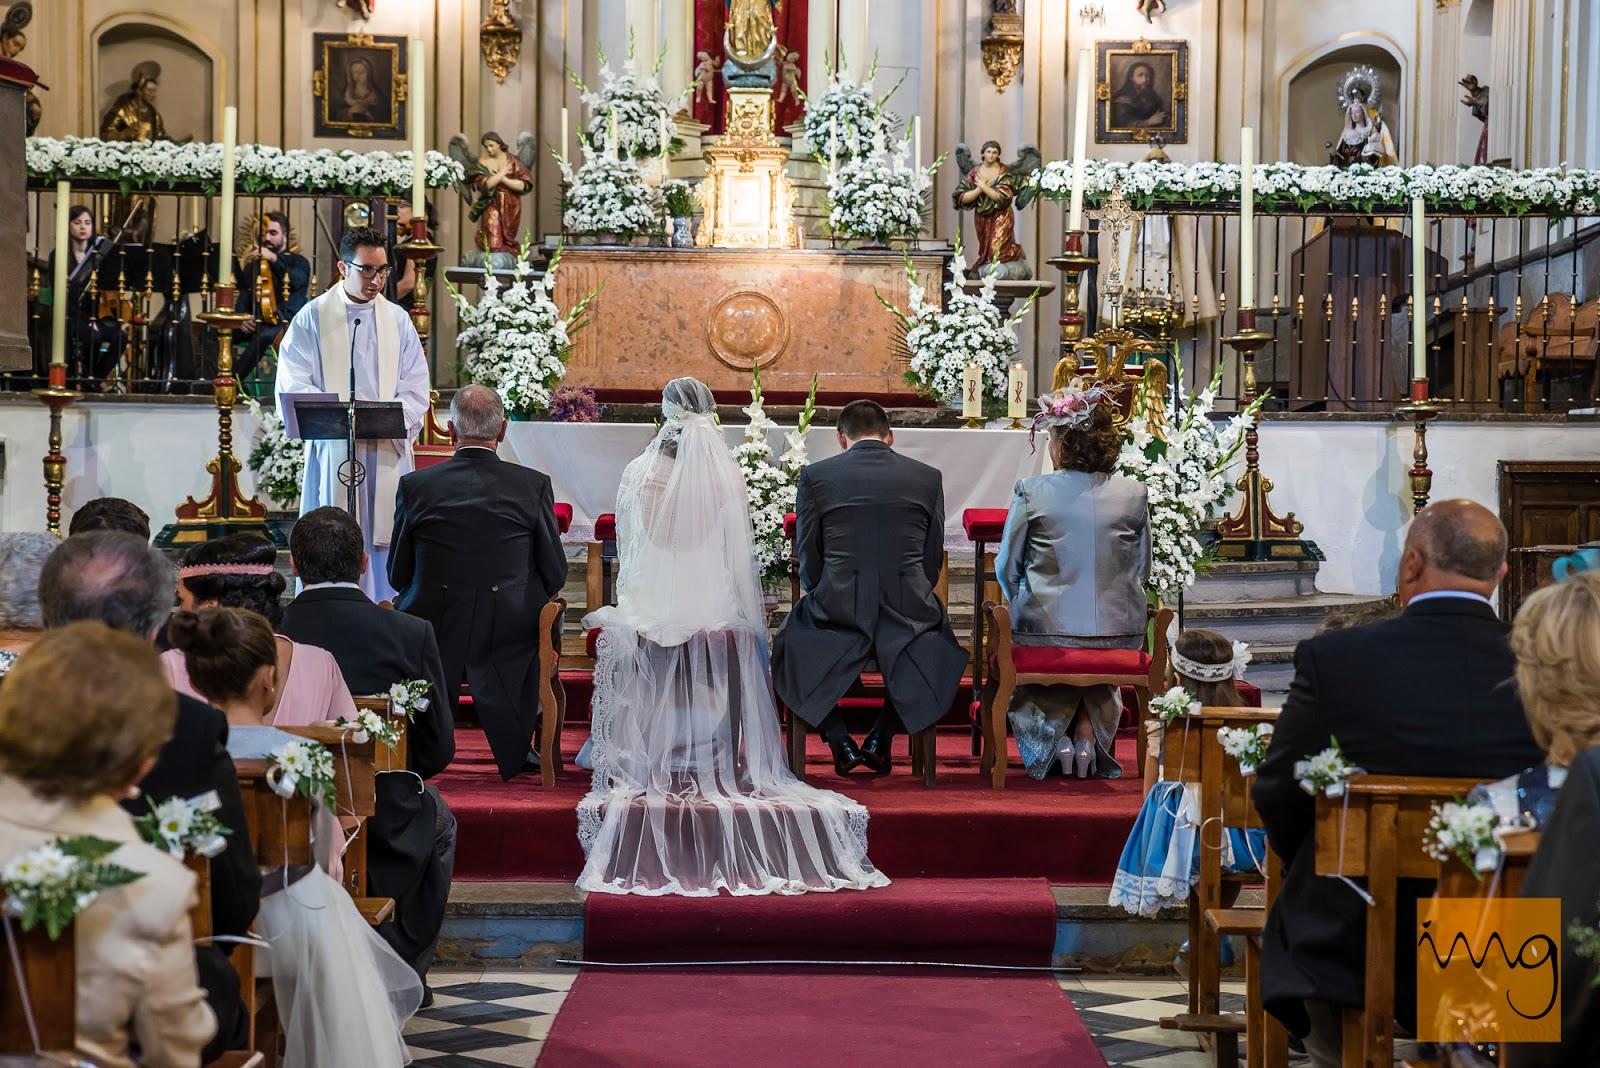 Fotografía de boda, Iglesia de Santa Ana en Granada